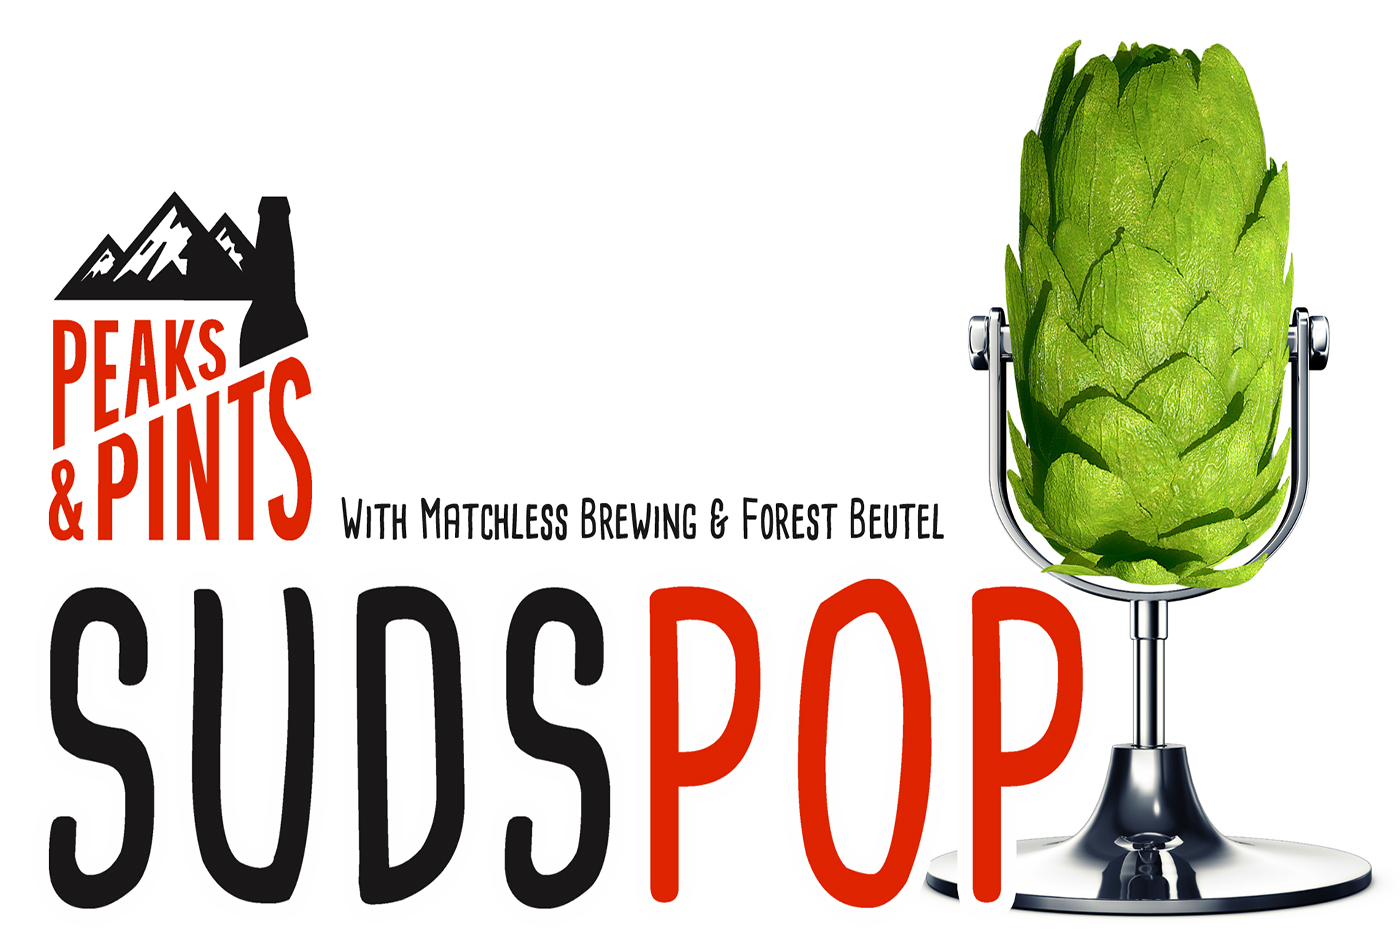 Peaks-and-Pints-Sudspop-Matchless-Brewing-Forest-Beutel-Calendar